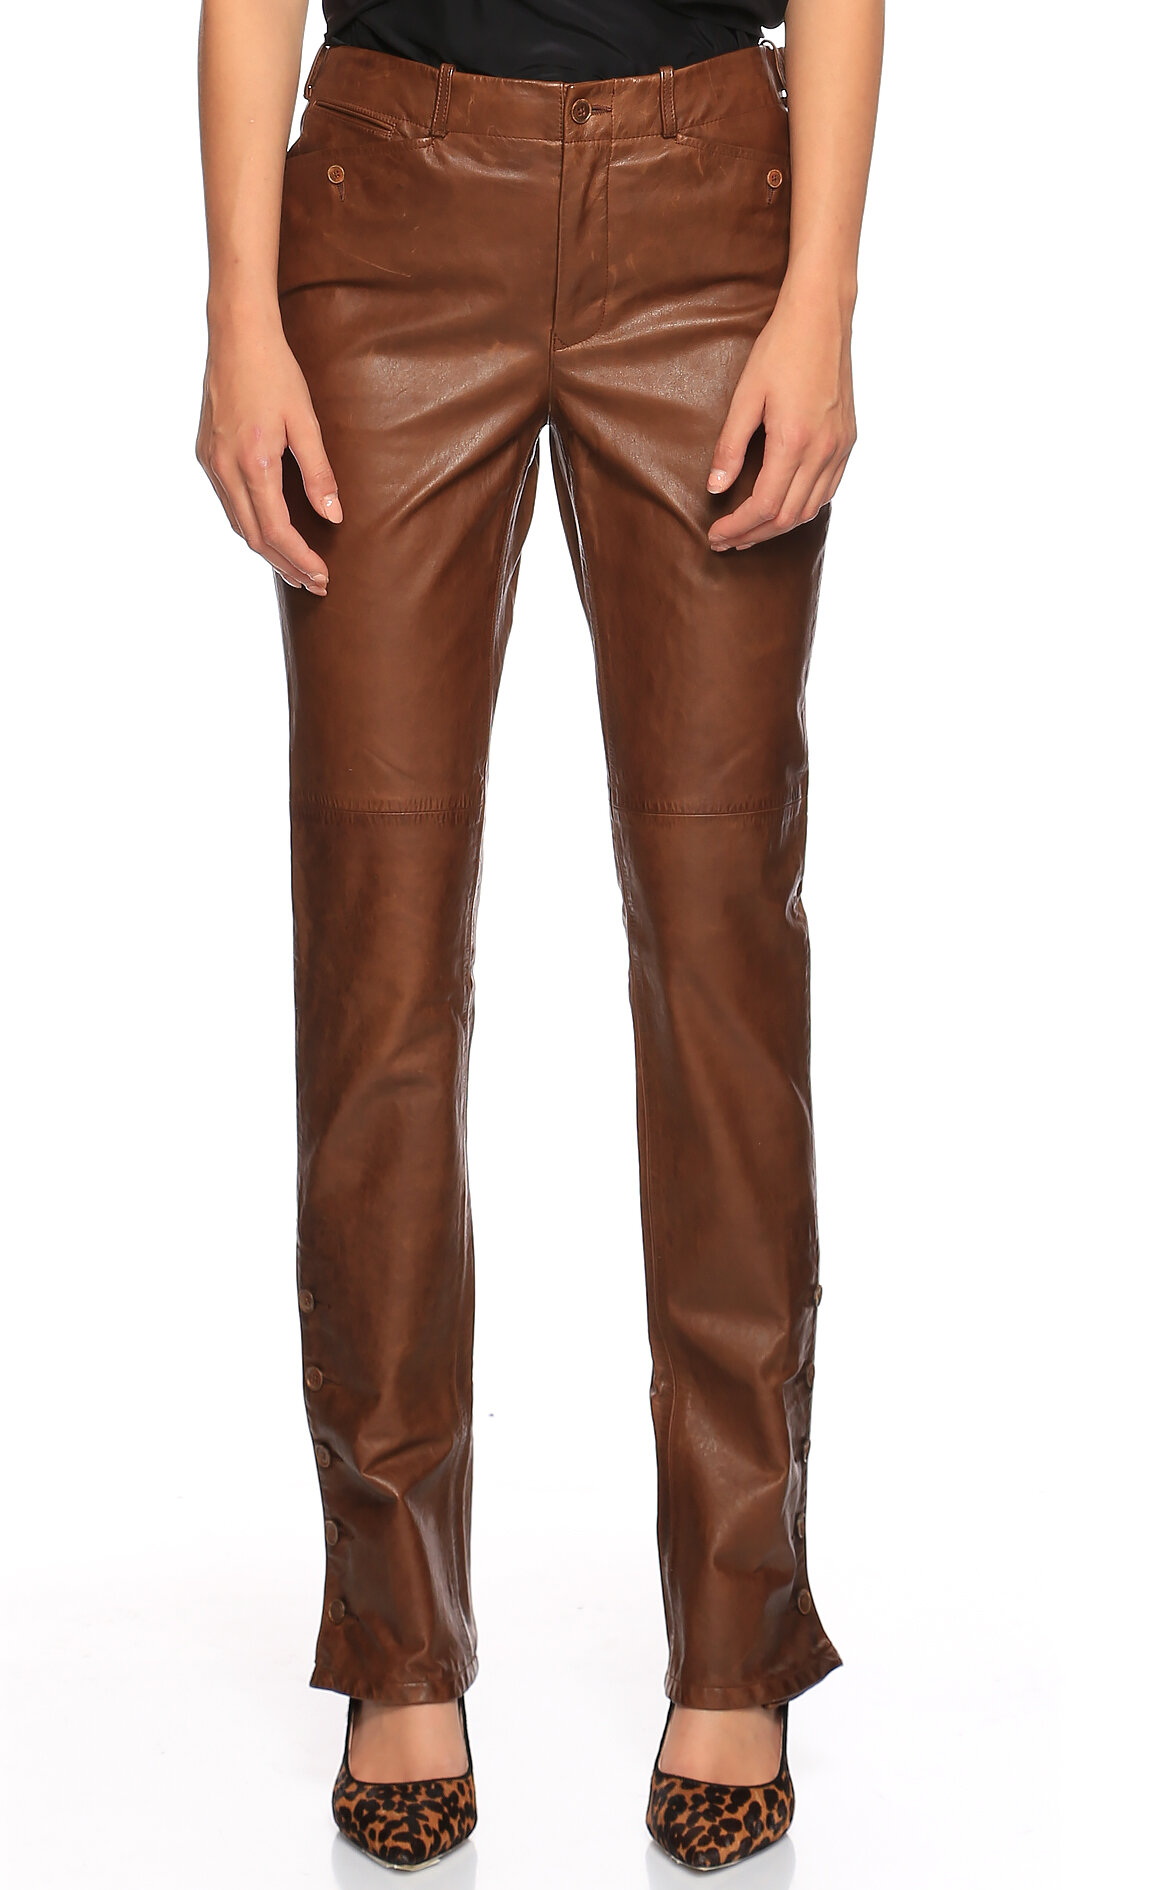 Ralph Lauren Blue Label-Ralph Lauren Blue Label Deri Kahverengi Pantolon